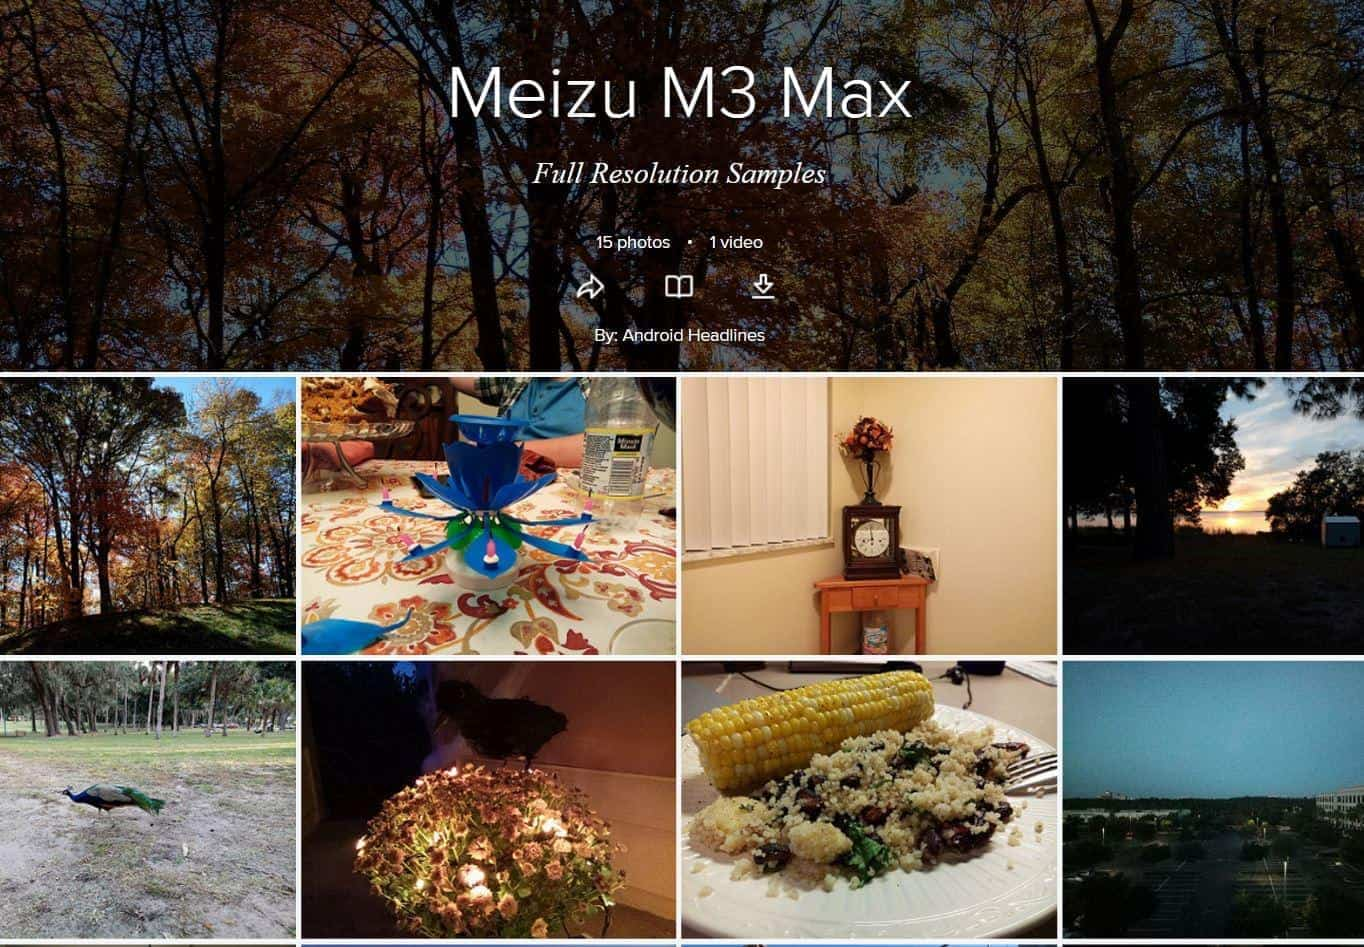 meizu-m3-max-ah-ns-flickr